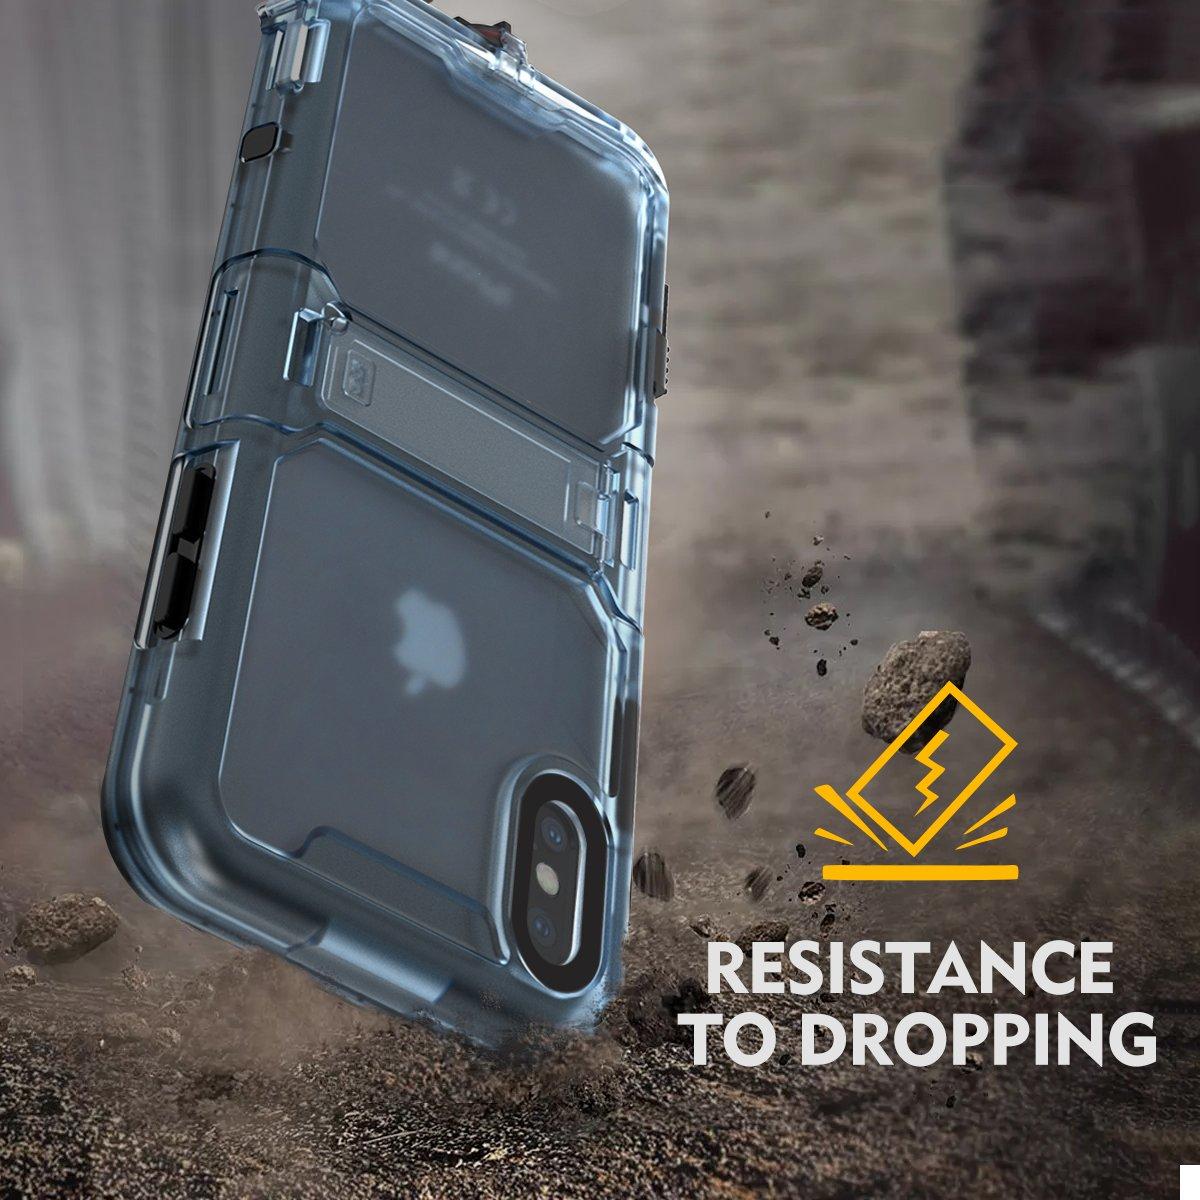 Cornmi iPhone X Waterproof Case, Full Sealed IP68 Certified Waterproof Shockproof Snowproof Protection Underwater Case for iPhone X 5.2inch (Black) by Cornmi (Image #6)